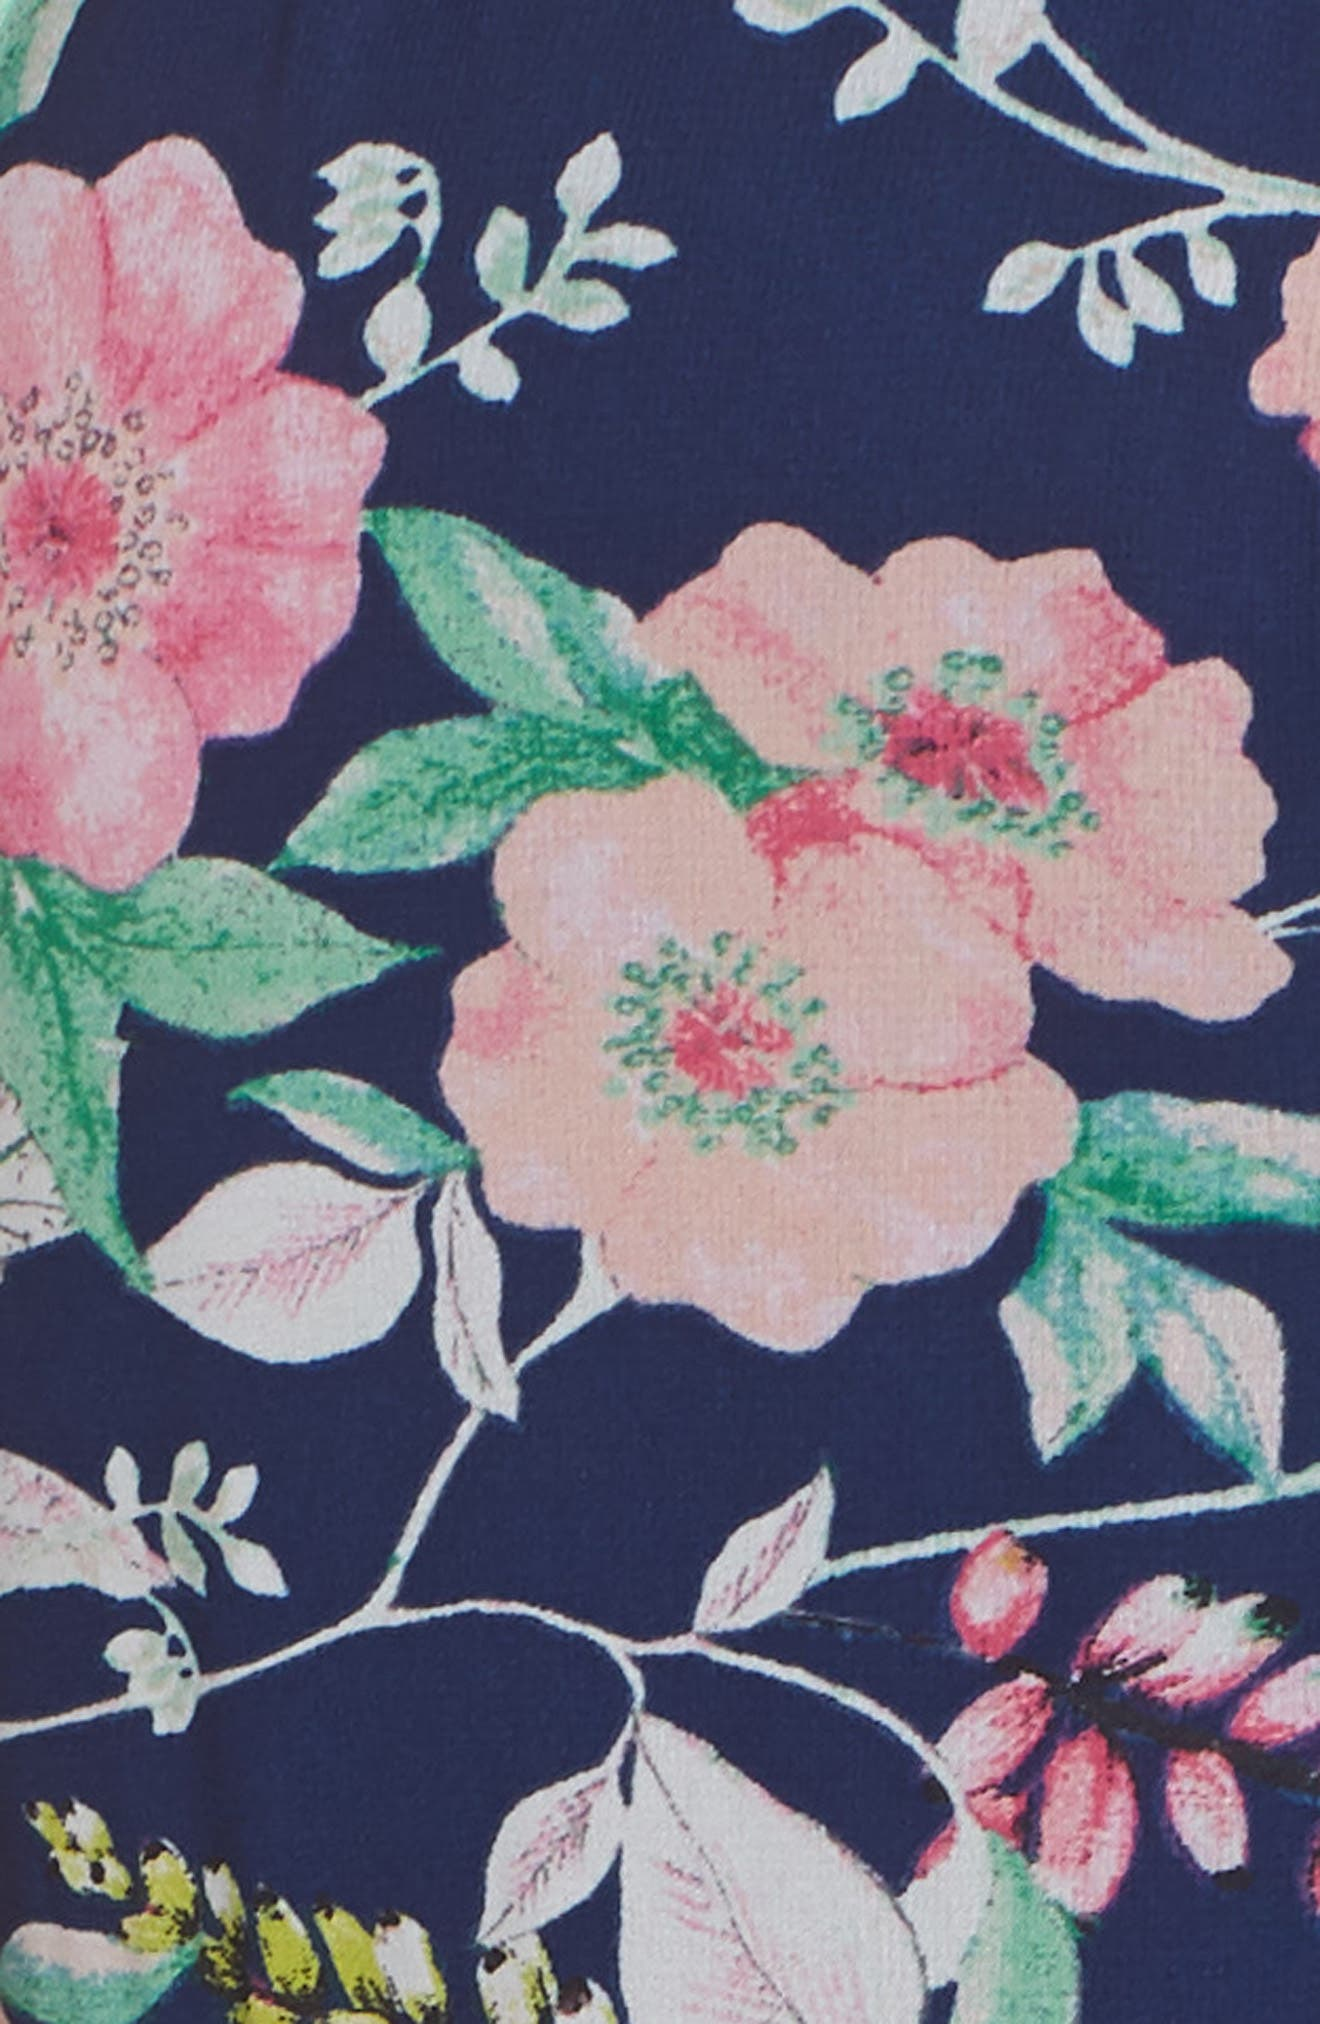 Halter Neck Fit & Flare Dress,                             Alternate thumbnail 6, color,                             Navy/ Pink